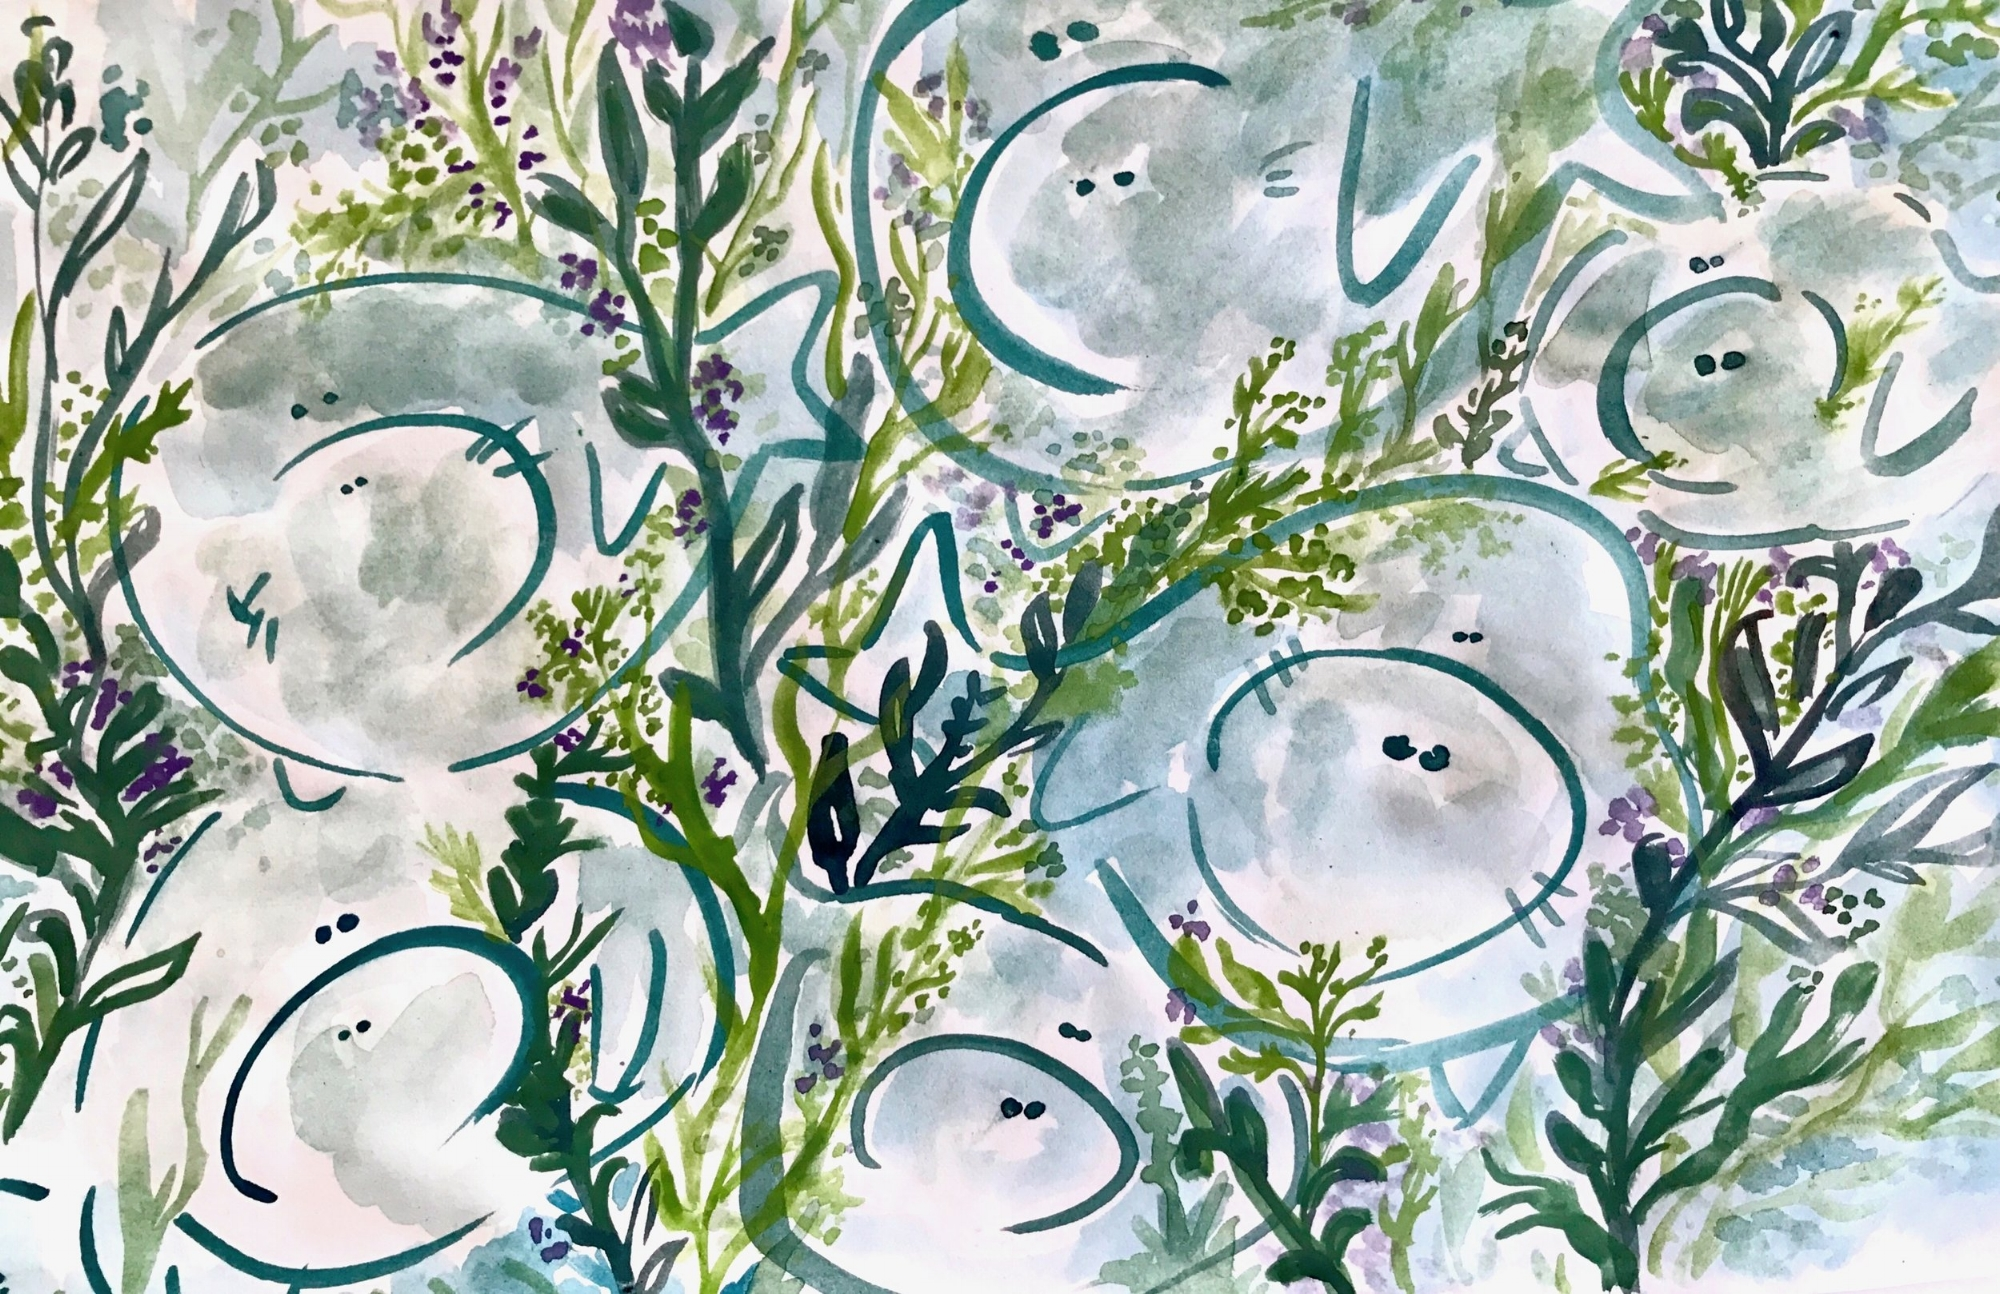 New collective noun: A plod of manatees